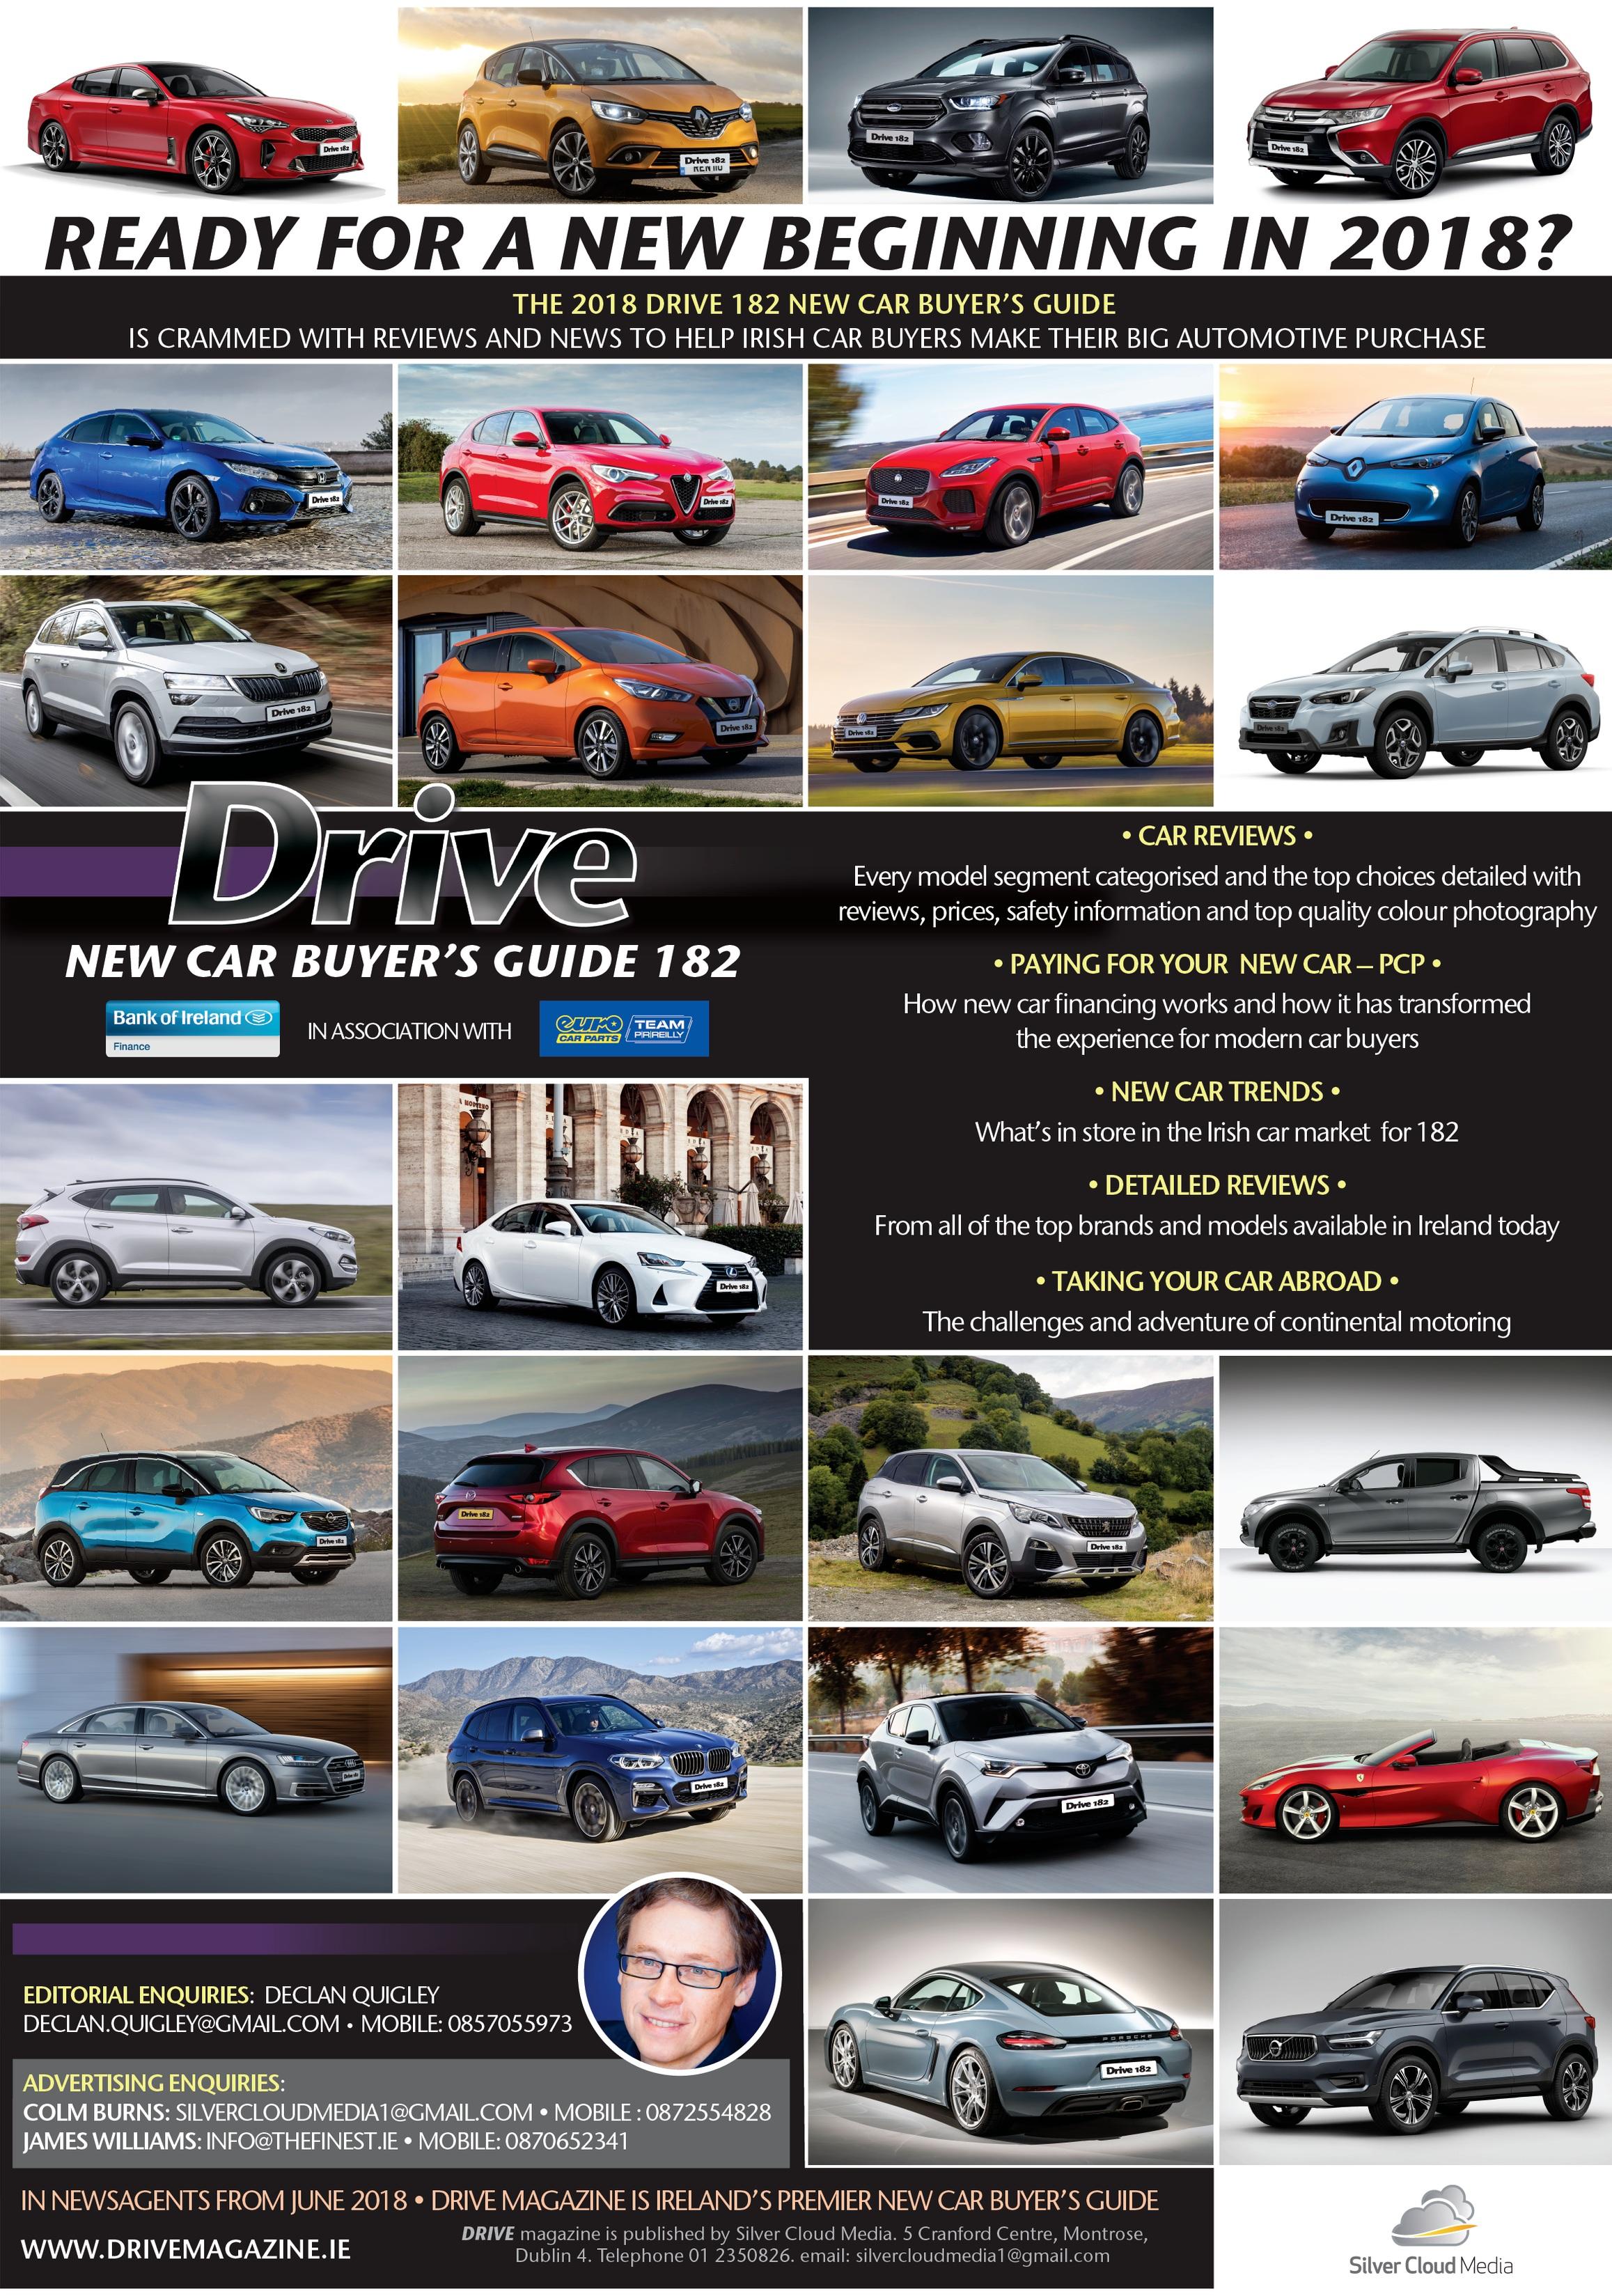 DRIVE 182 FINAL 030518-02.png